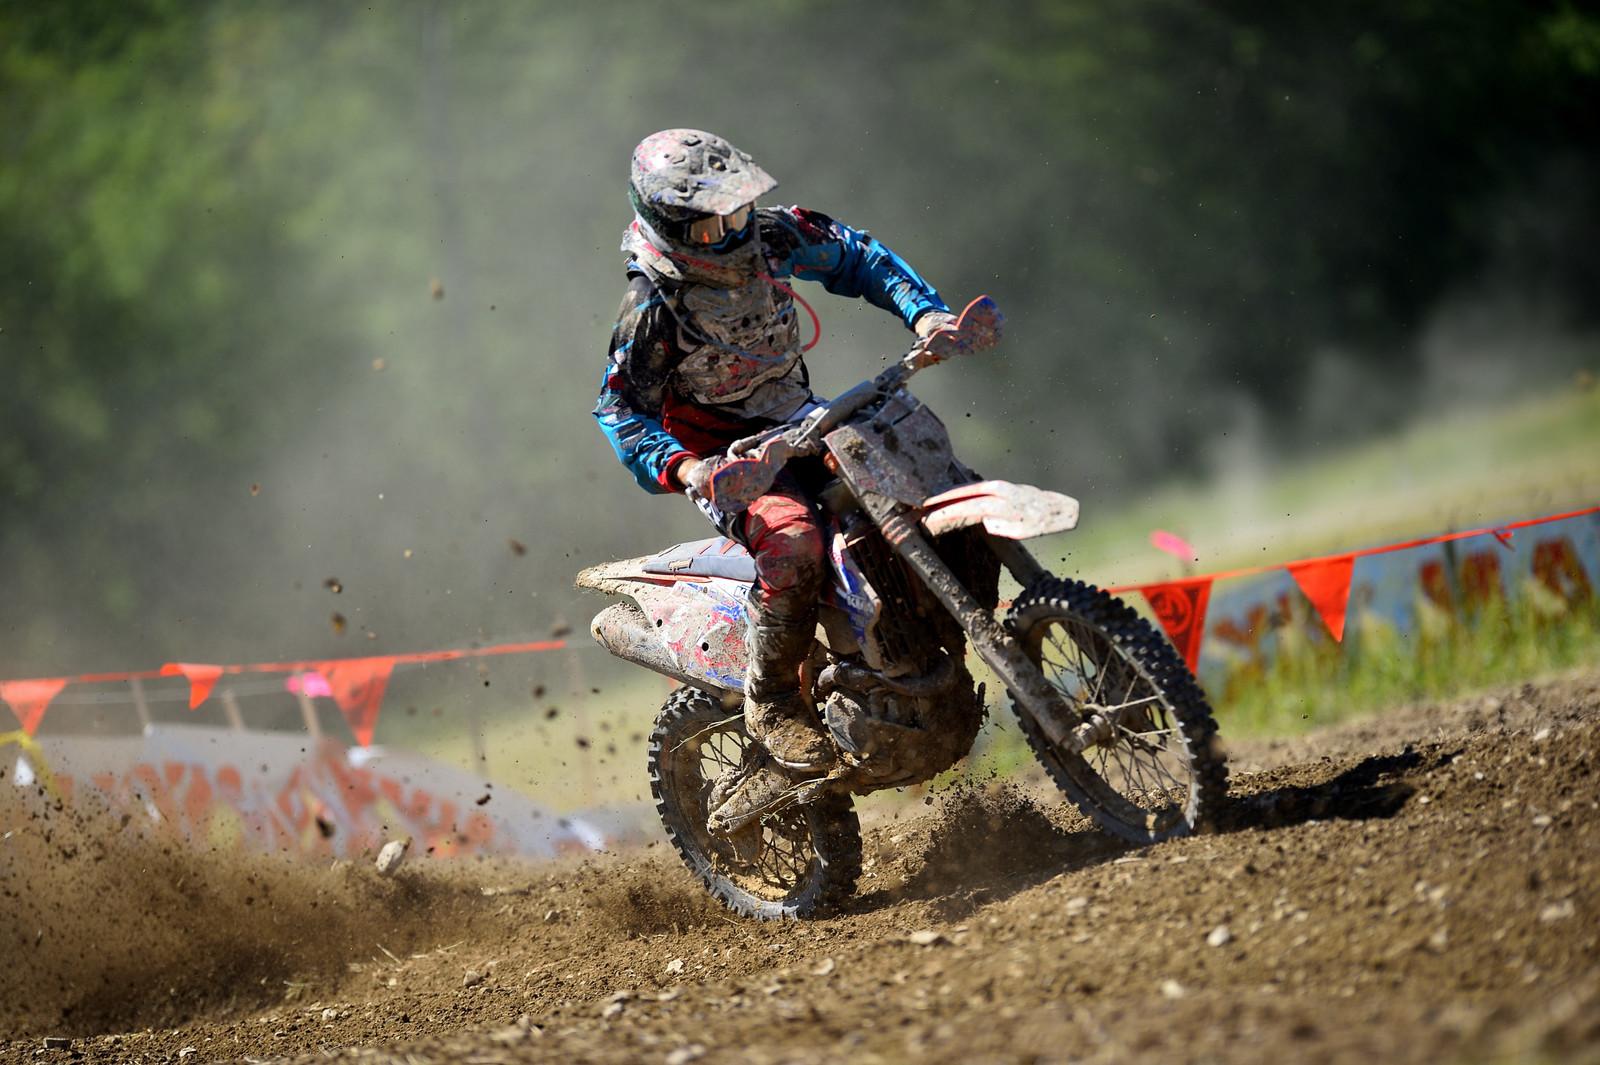 Steward Baylor - Tomahawk GNCC - Motocross Pictures - Vital MX